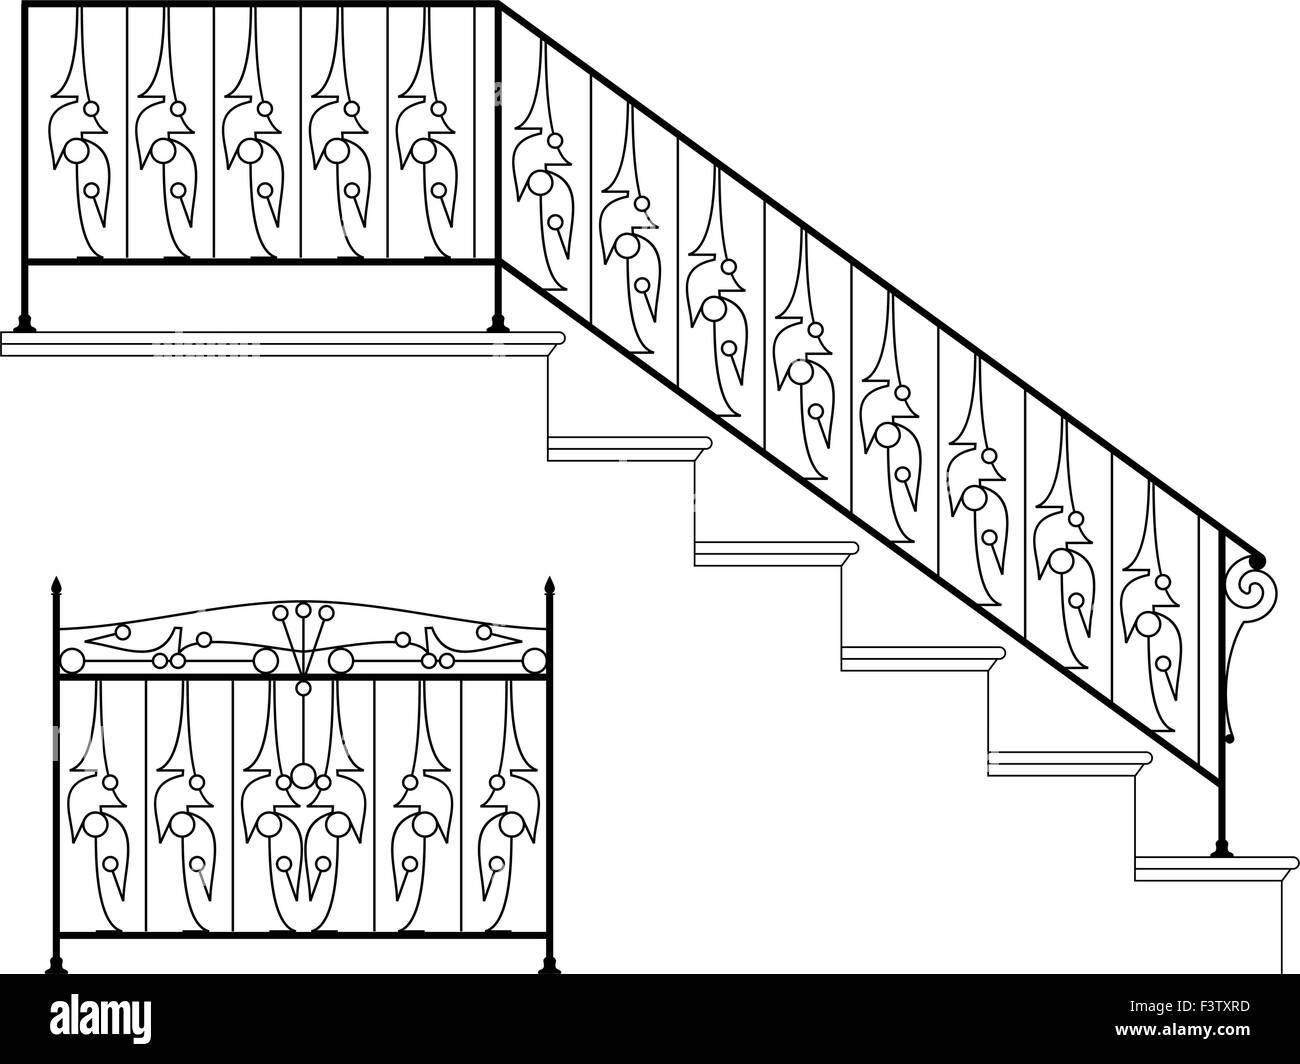 Wrought Iron Stair Railing Design Vector Art Stock Vector Art